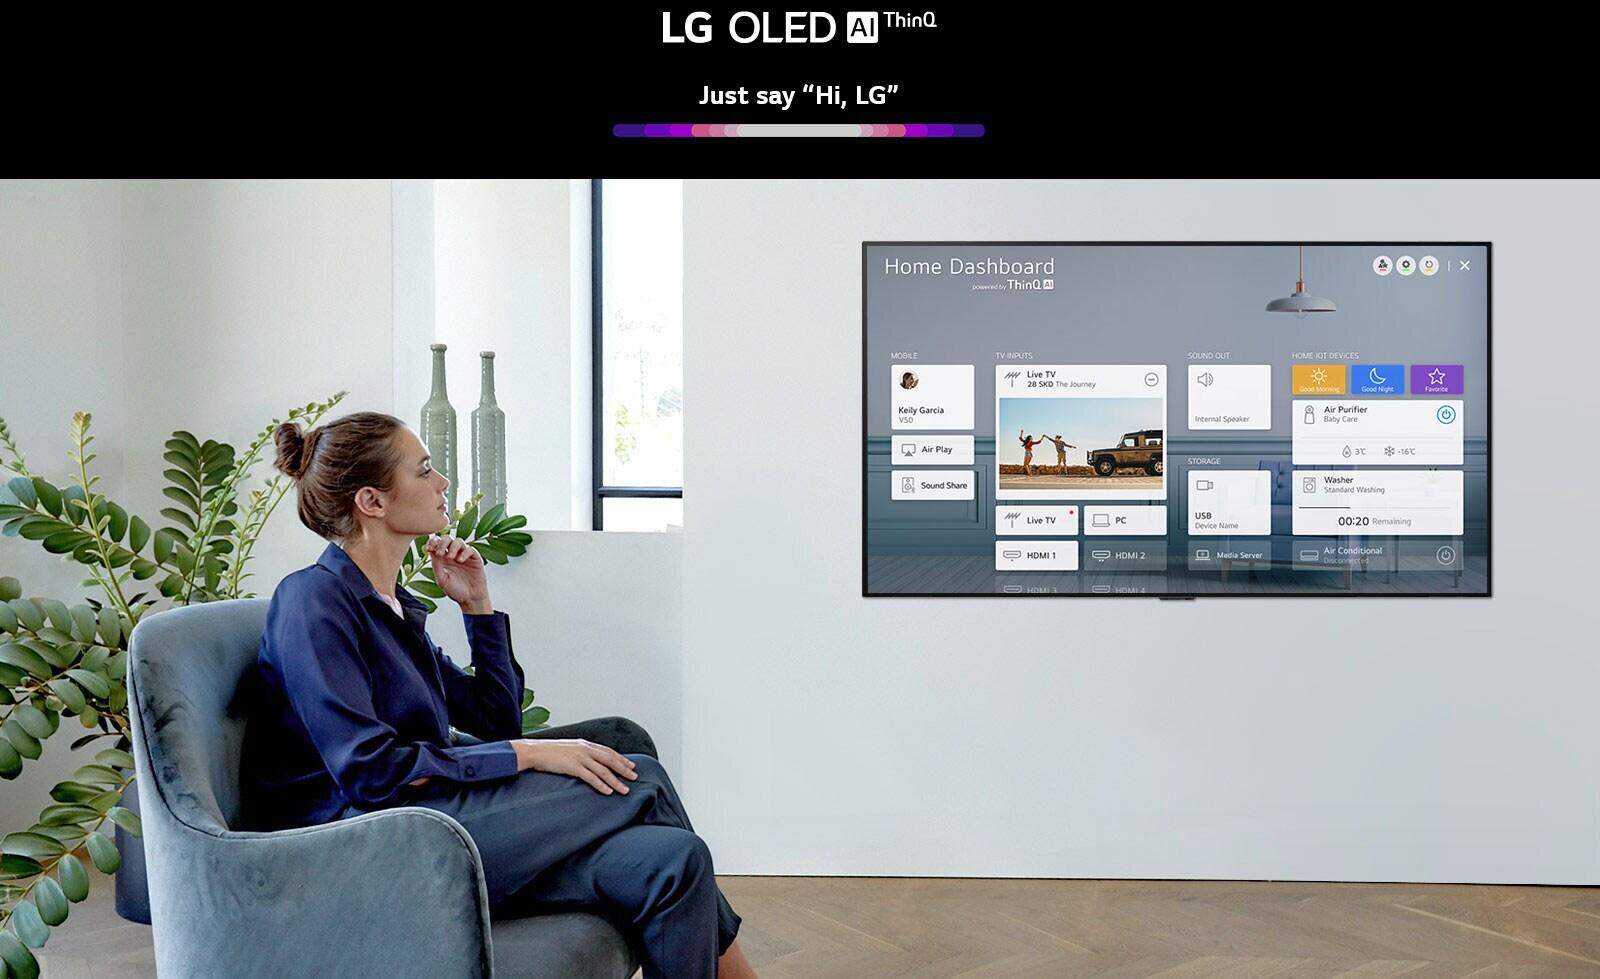 LG OLED77GXPTA AI ThinQ